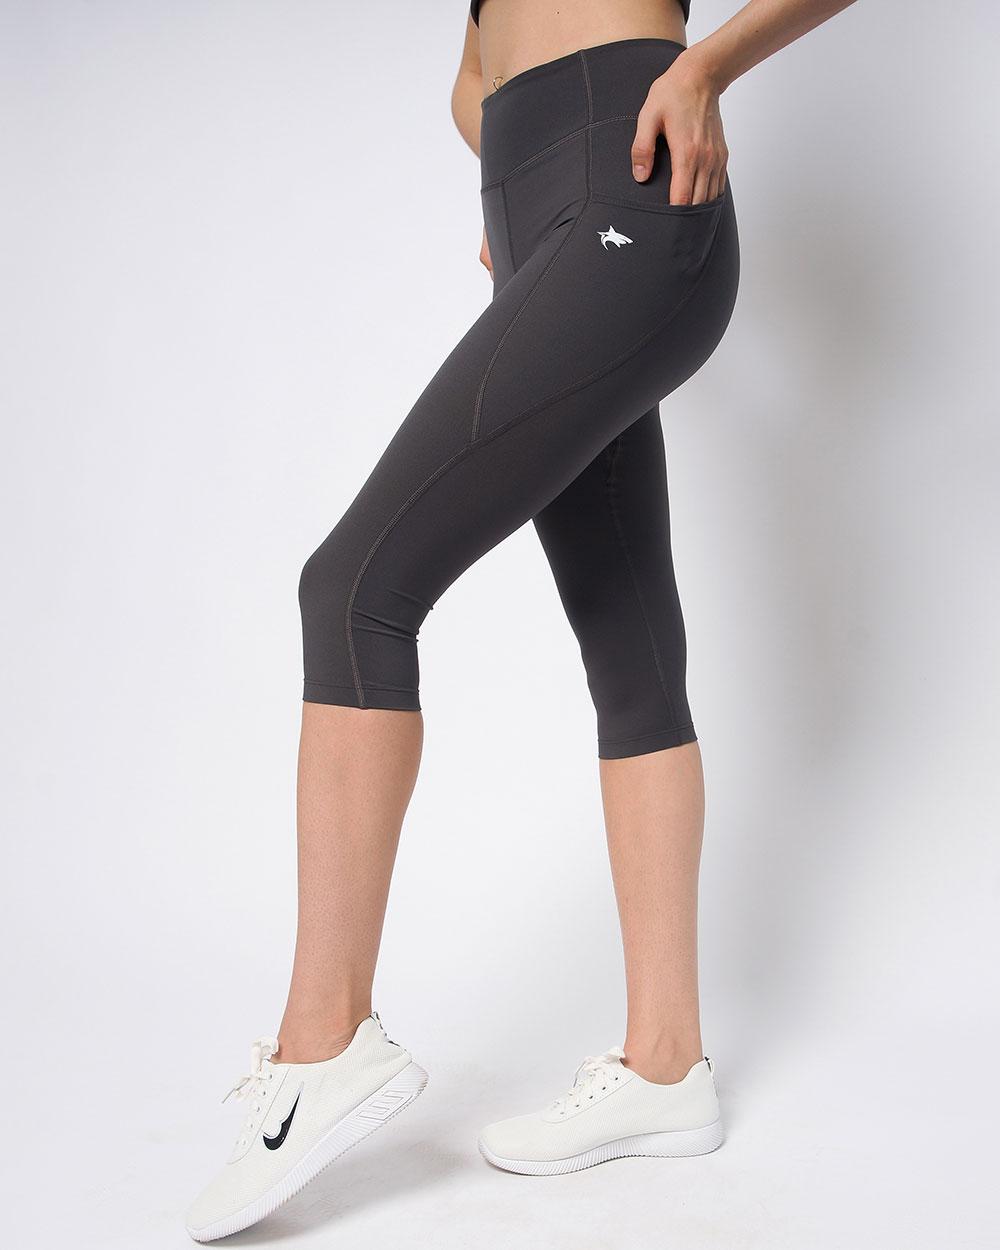 Quần legging nữ WL330